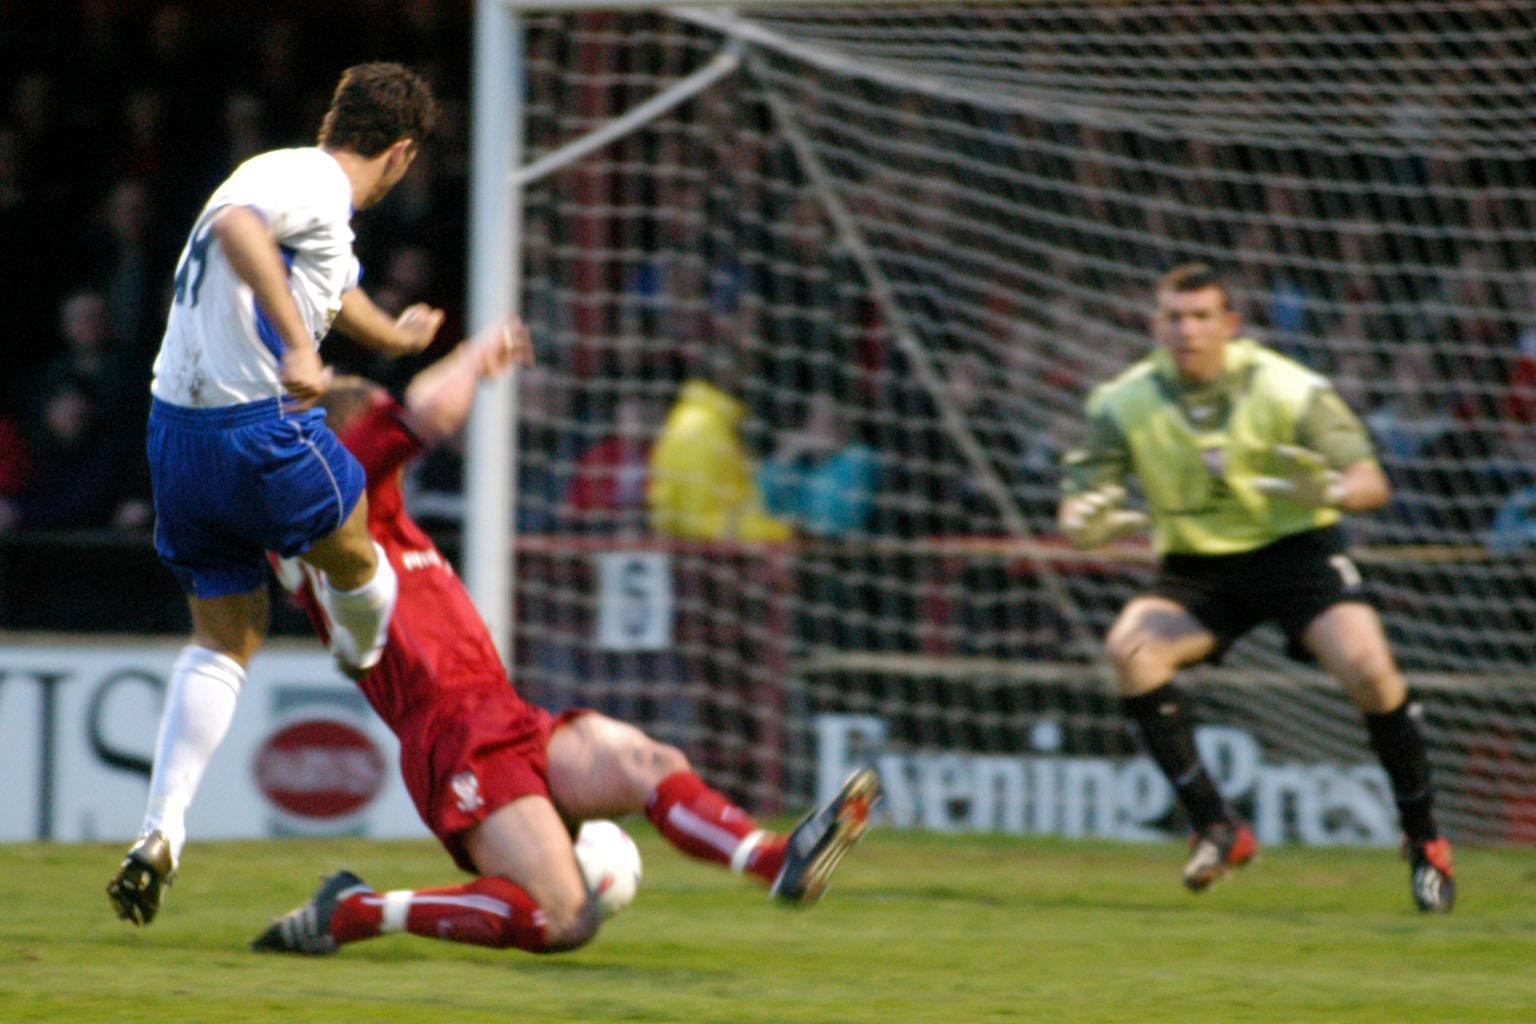 Bury FC through the years: Gareth Seddon scores his final Shakers goal